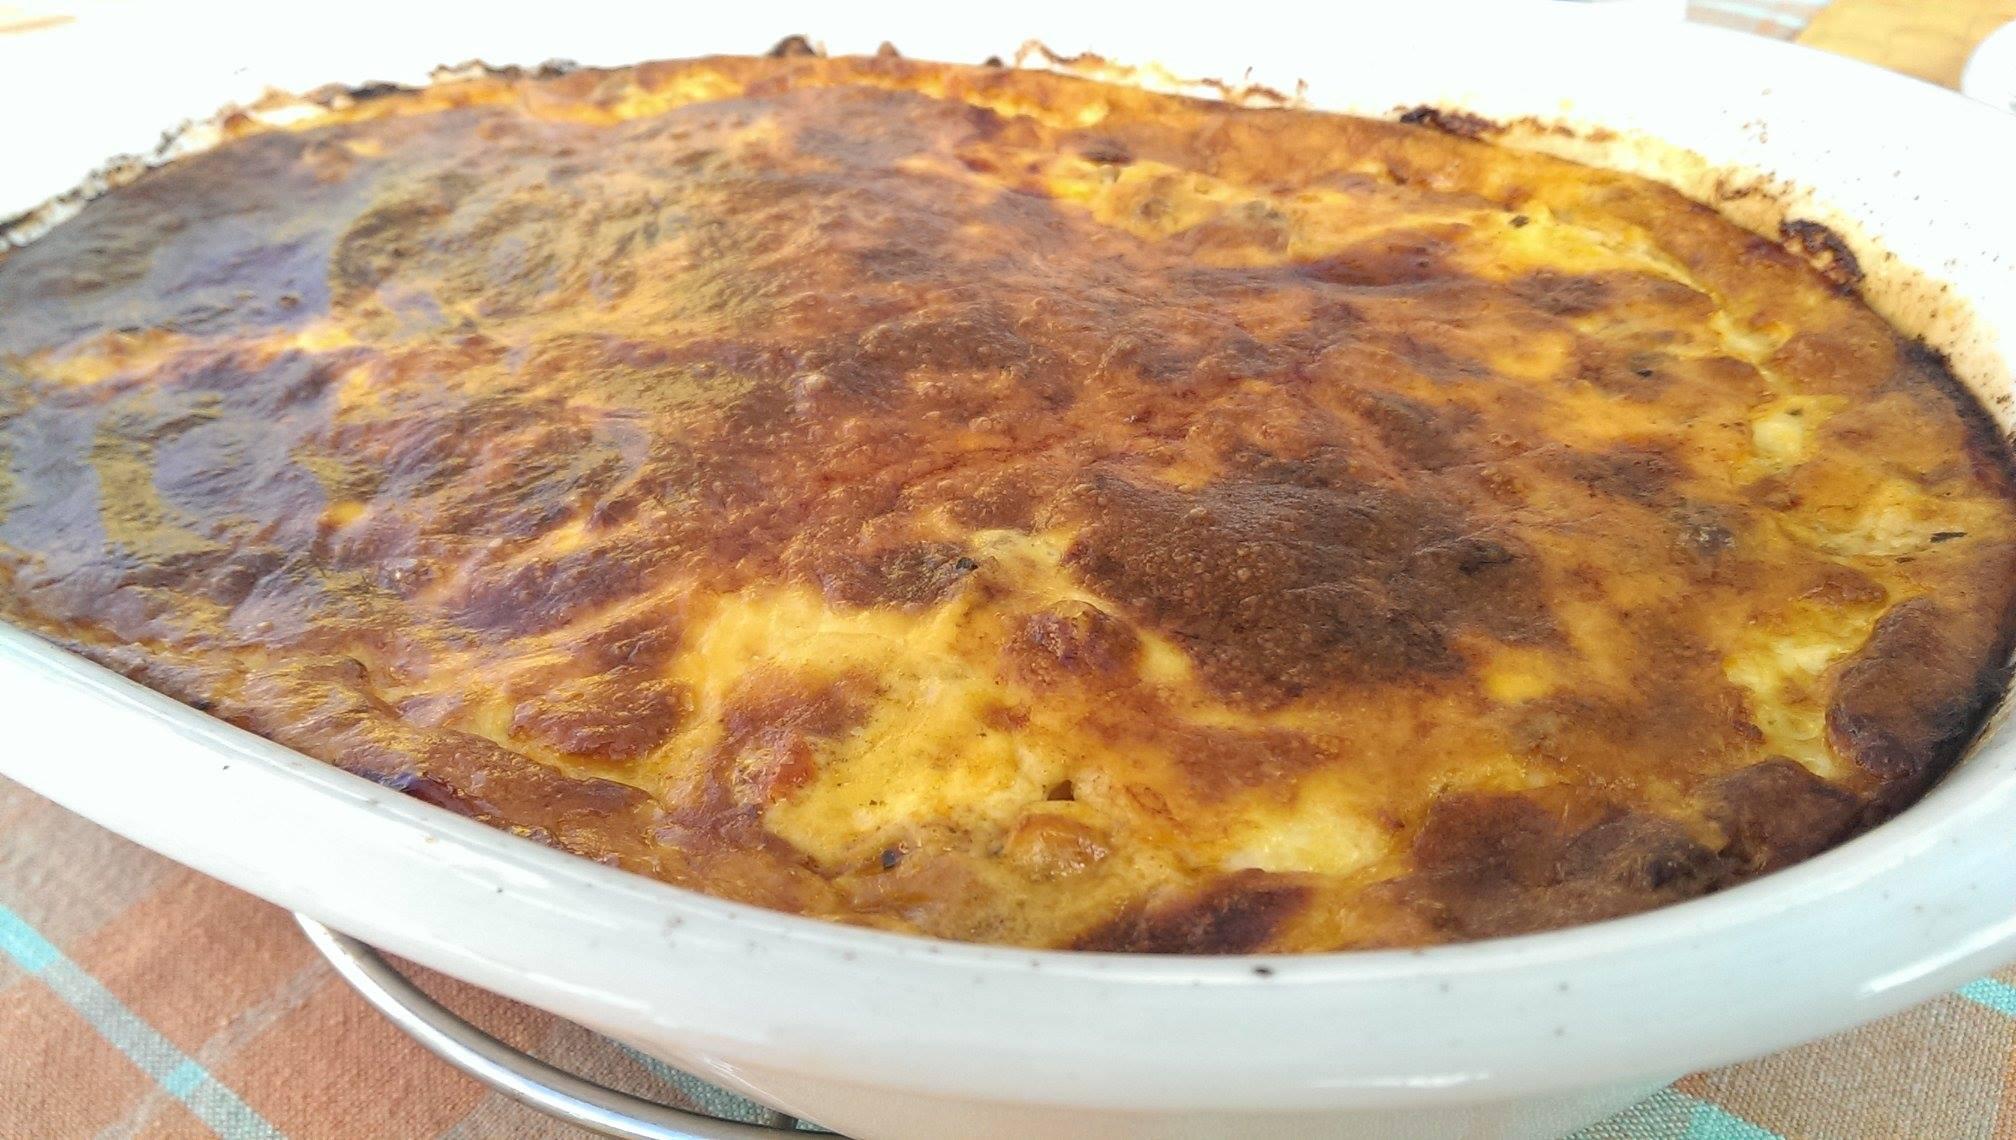 Lækker moussaka, direkte fra ovnen